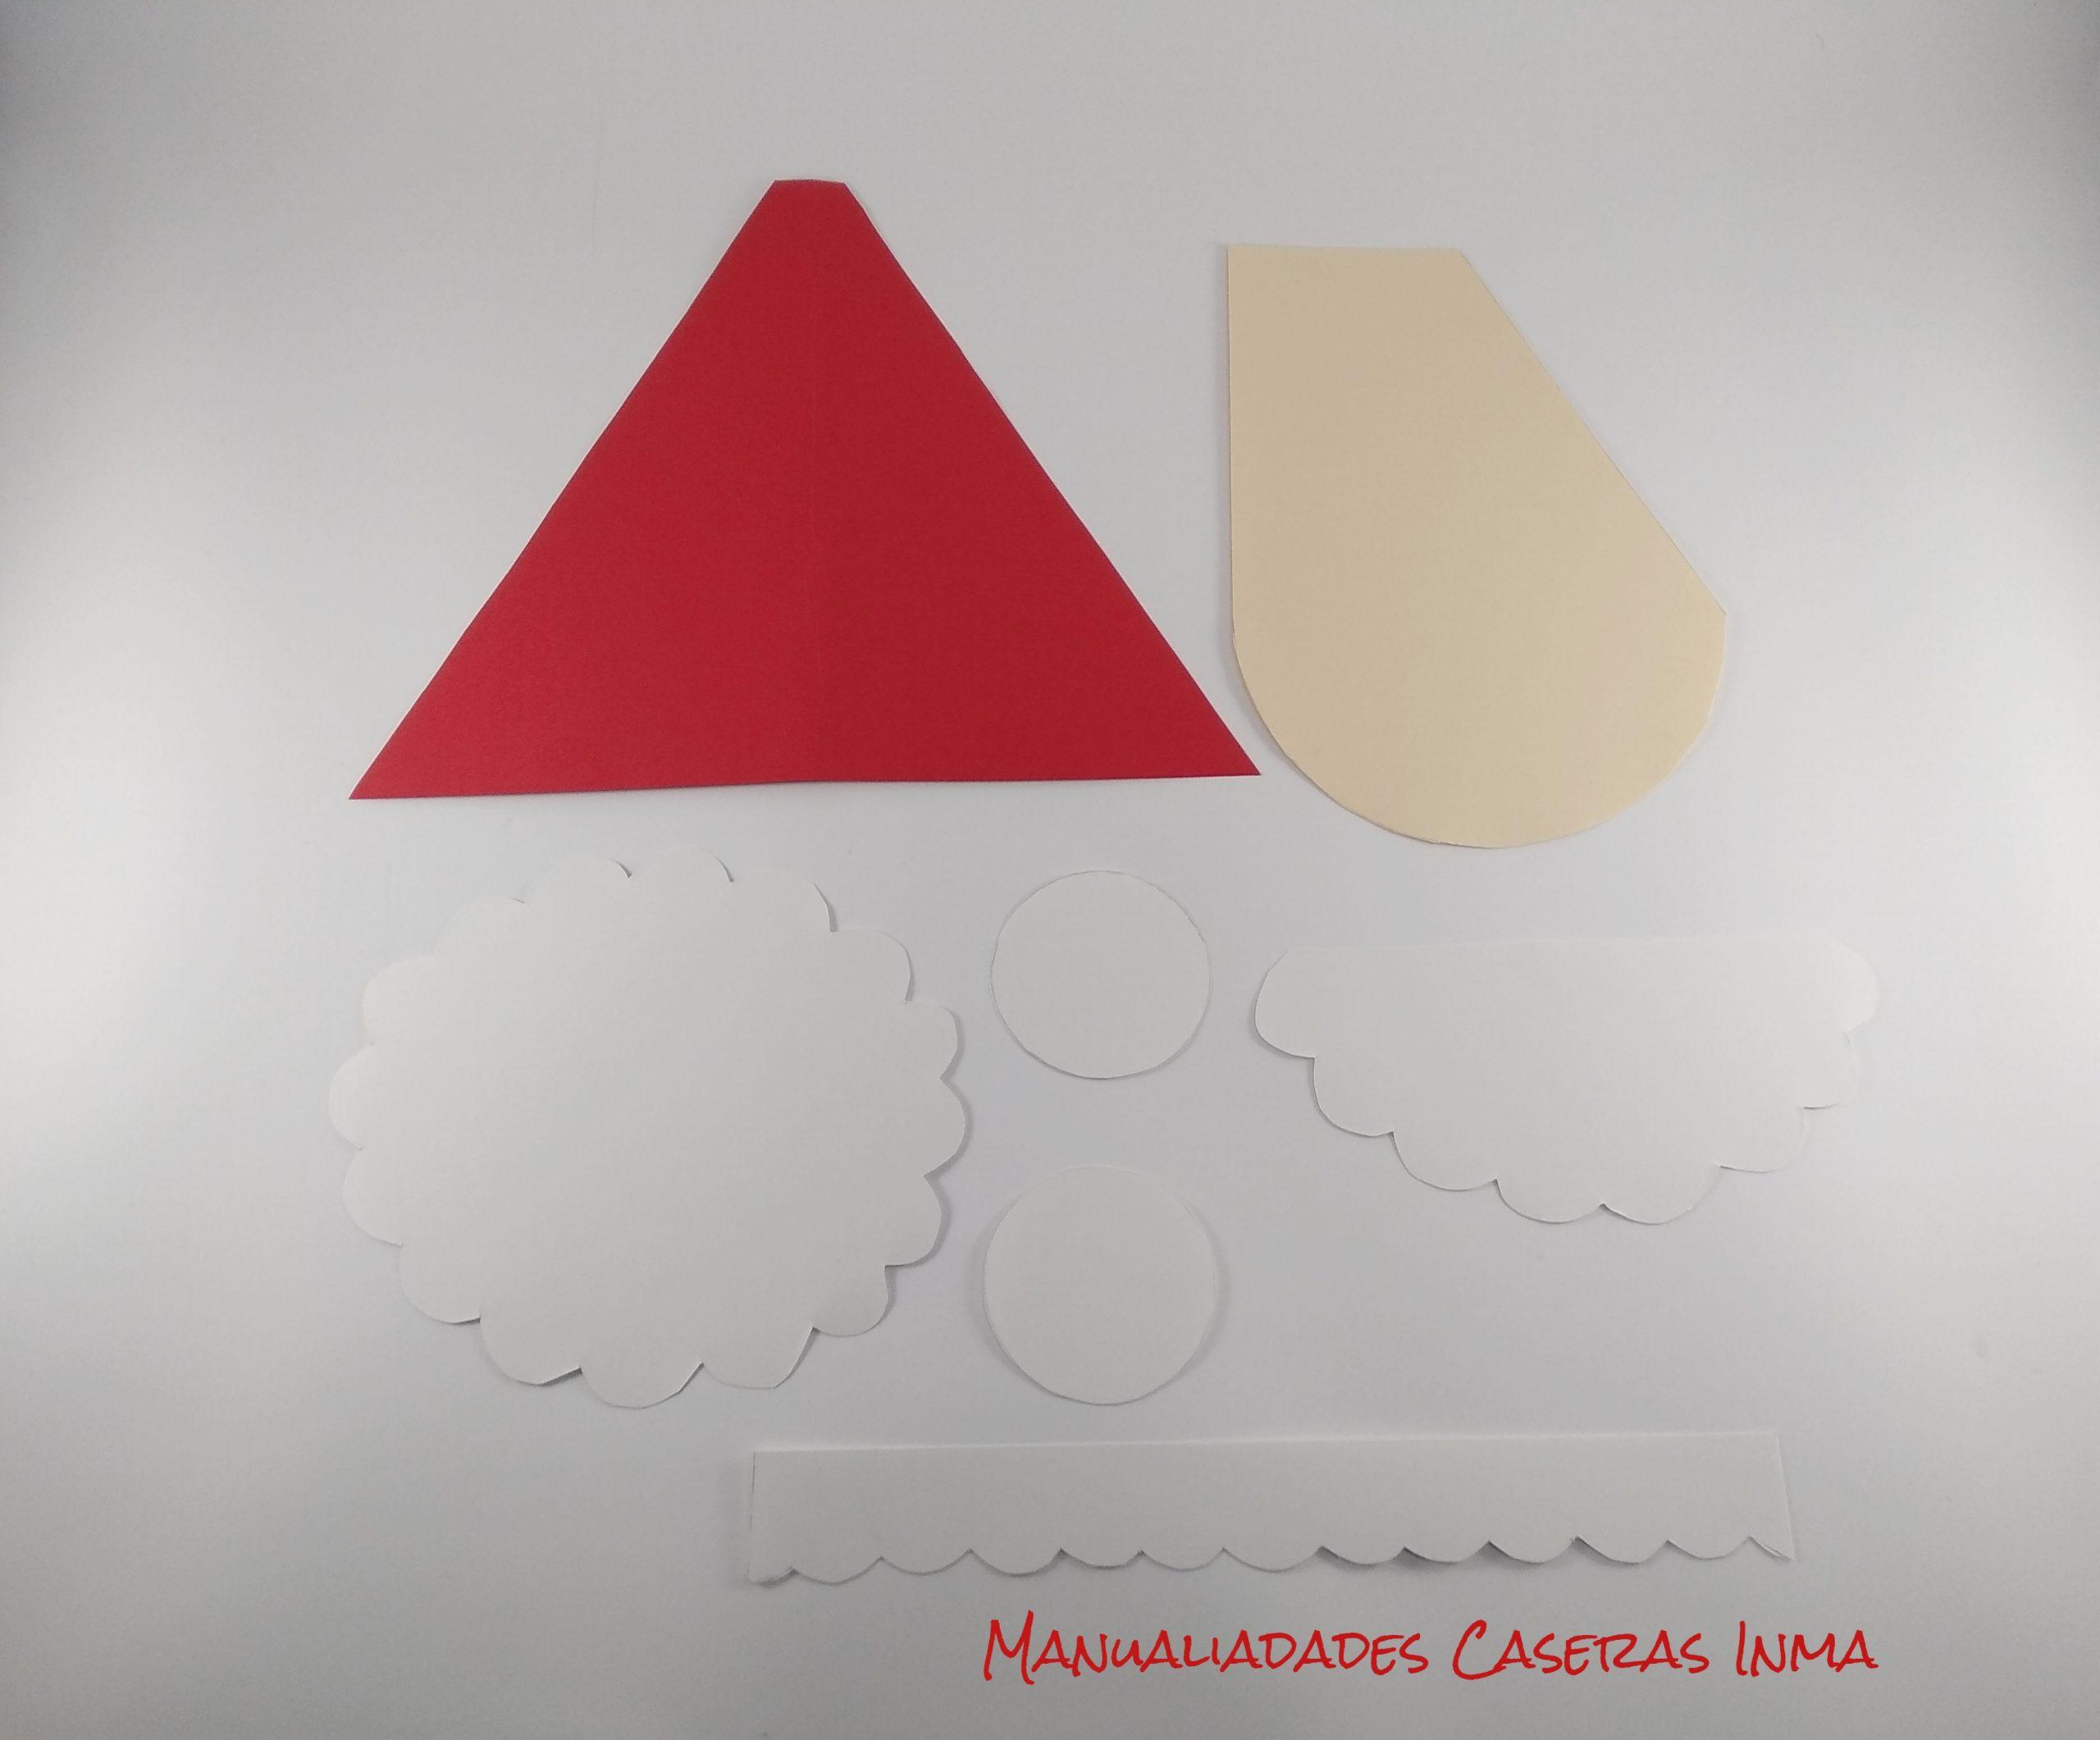 Manualidades Caseras Inma_ parte tarjeta Papa Noel